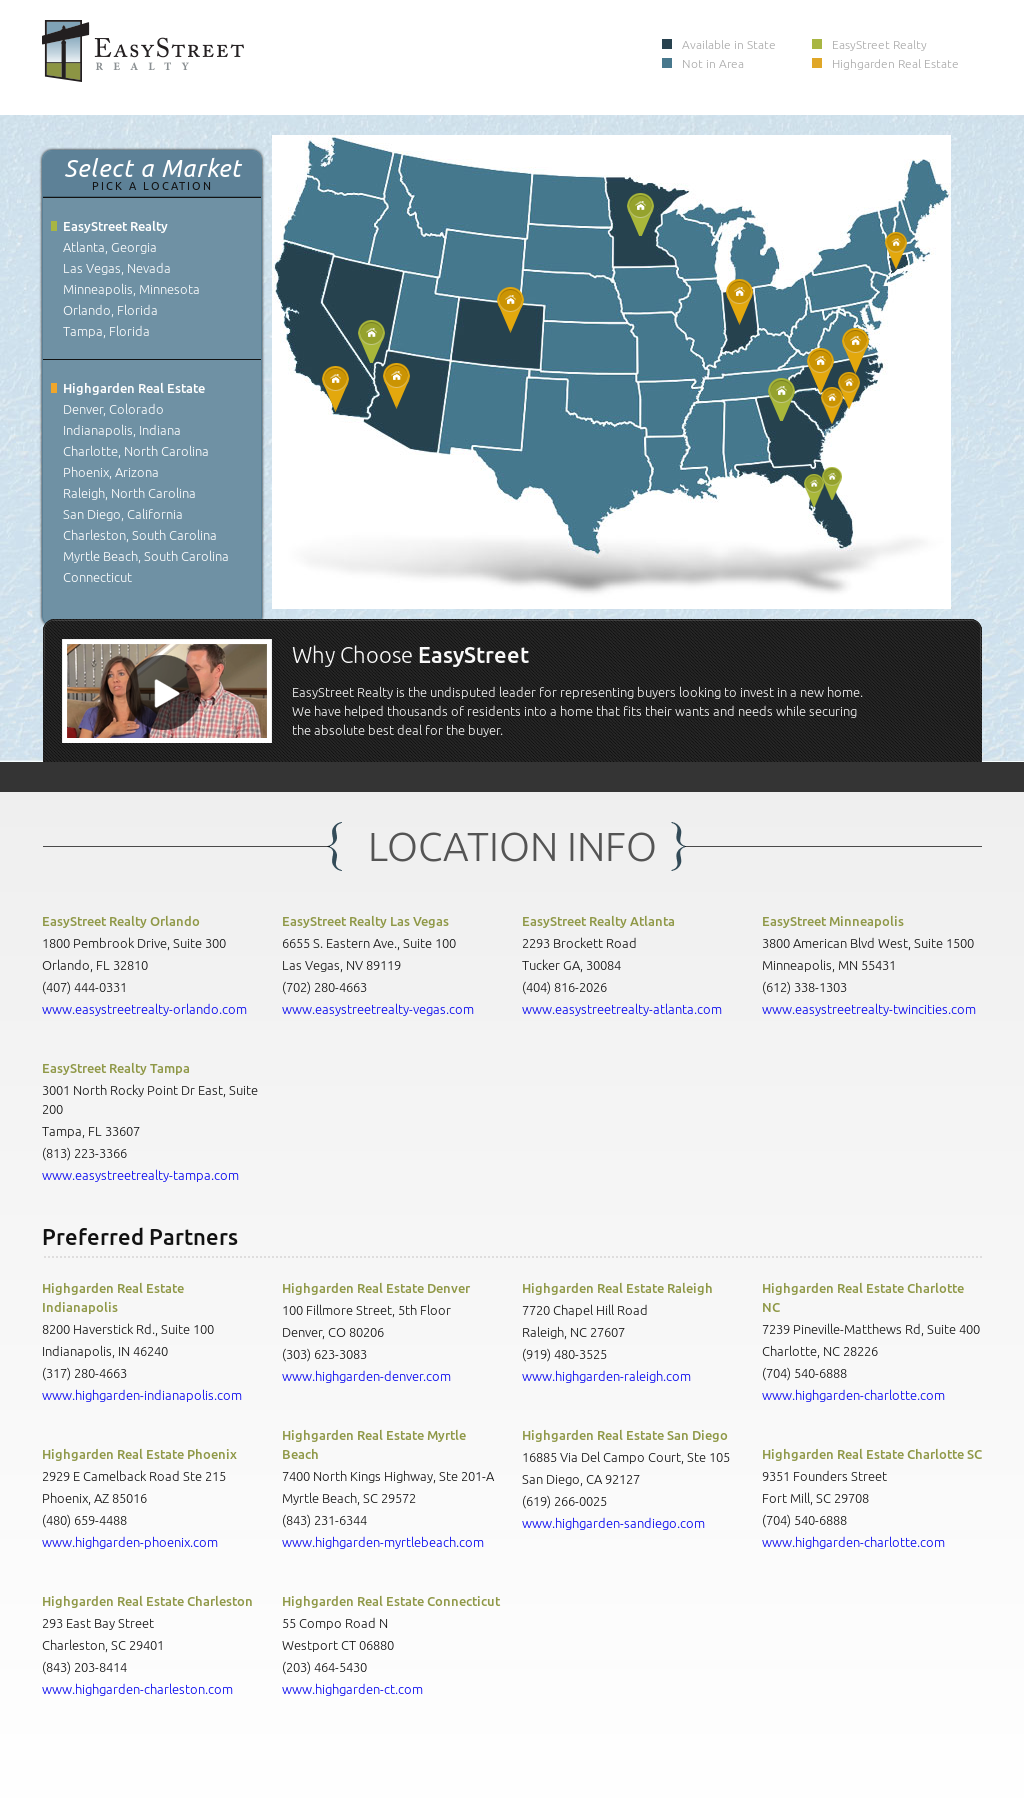 Easystreet Realty Website History